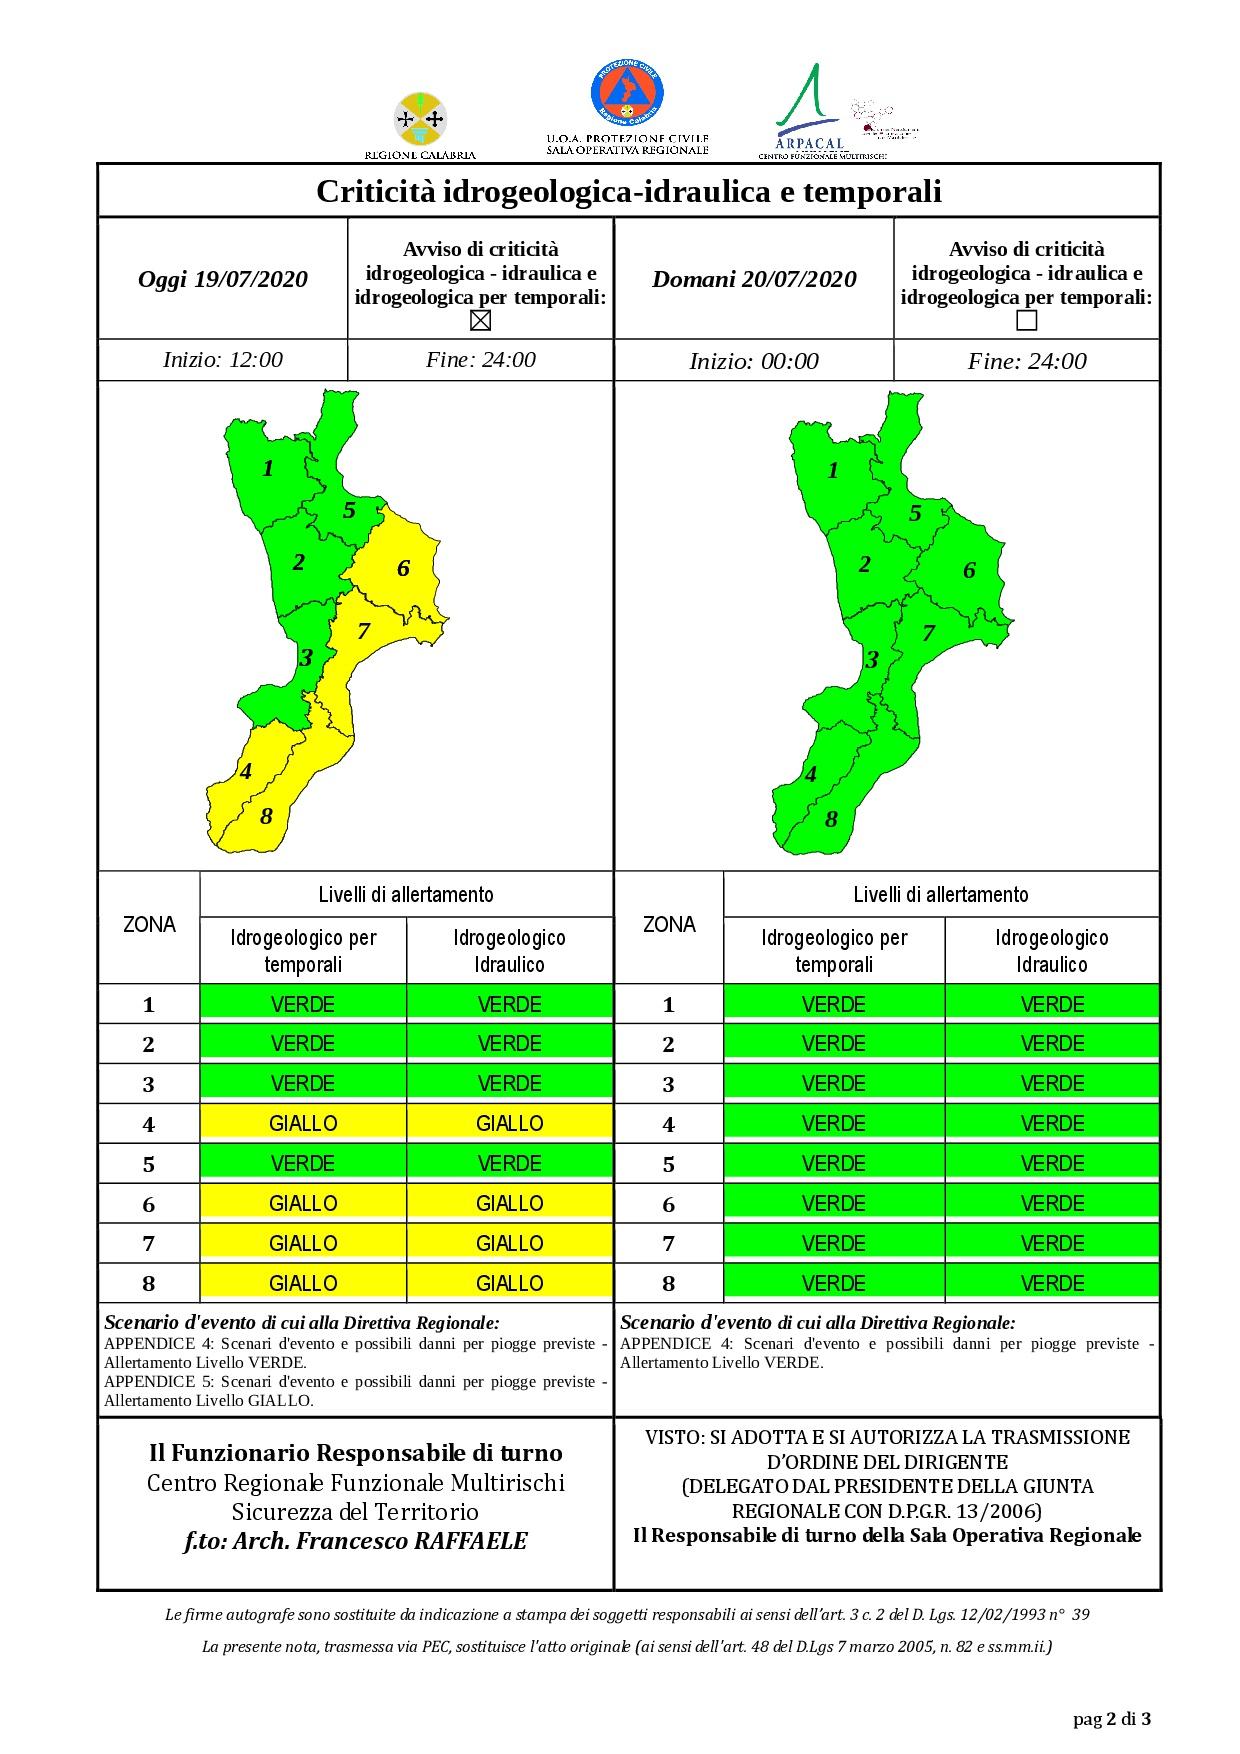 Criticità idrogeologica-idraulica e temporali in Calabria 19-07-2020